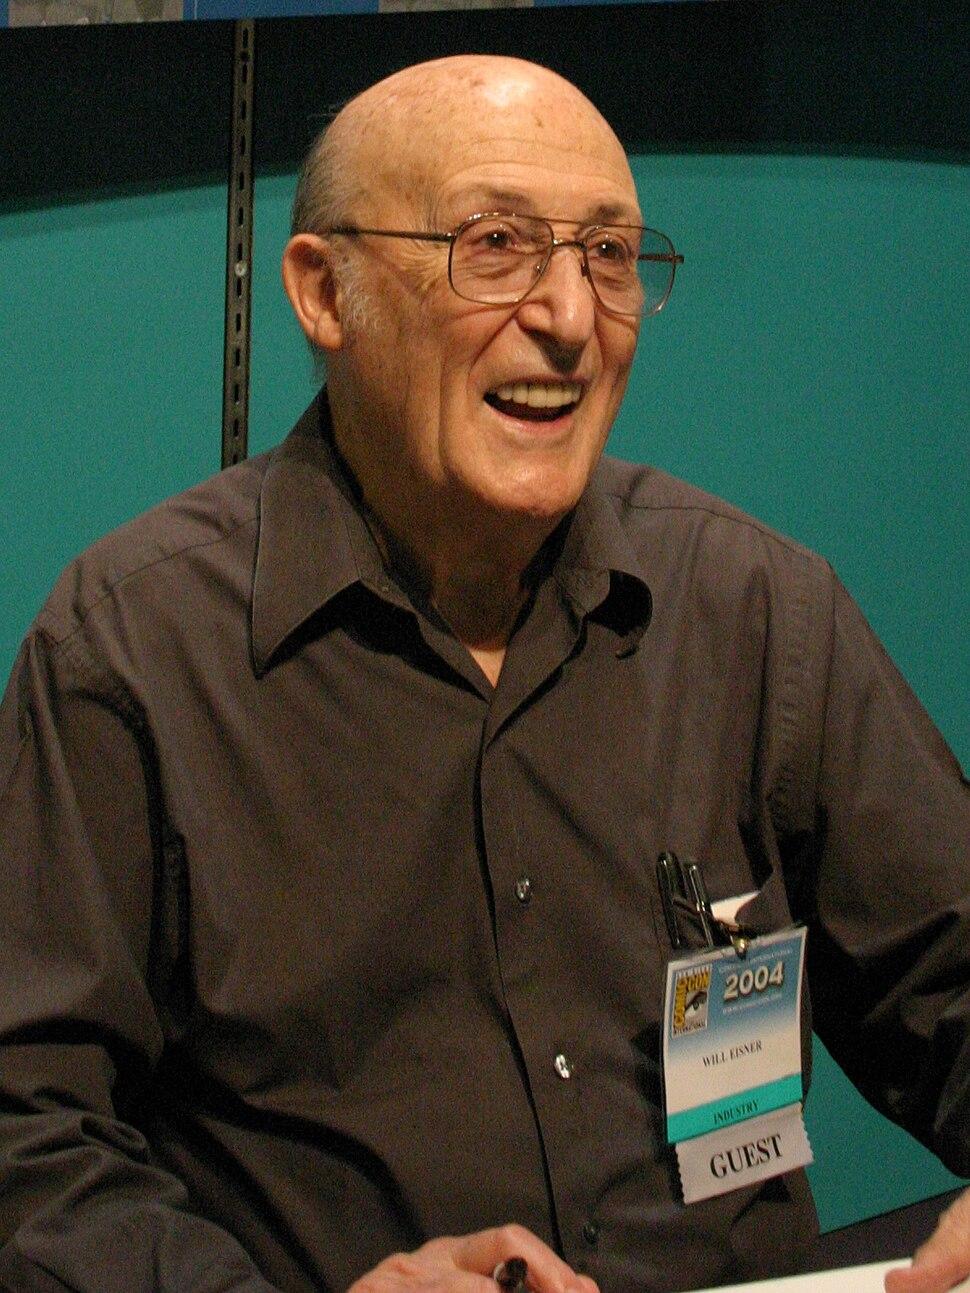 Will Eisner (San Diego Comic Con, 2004)